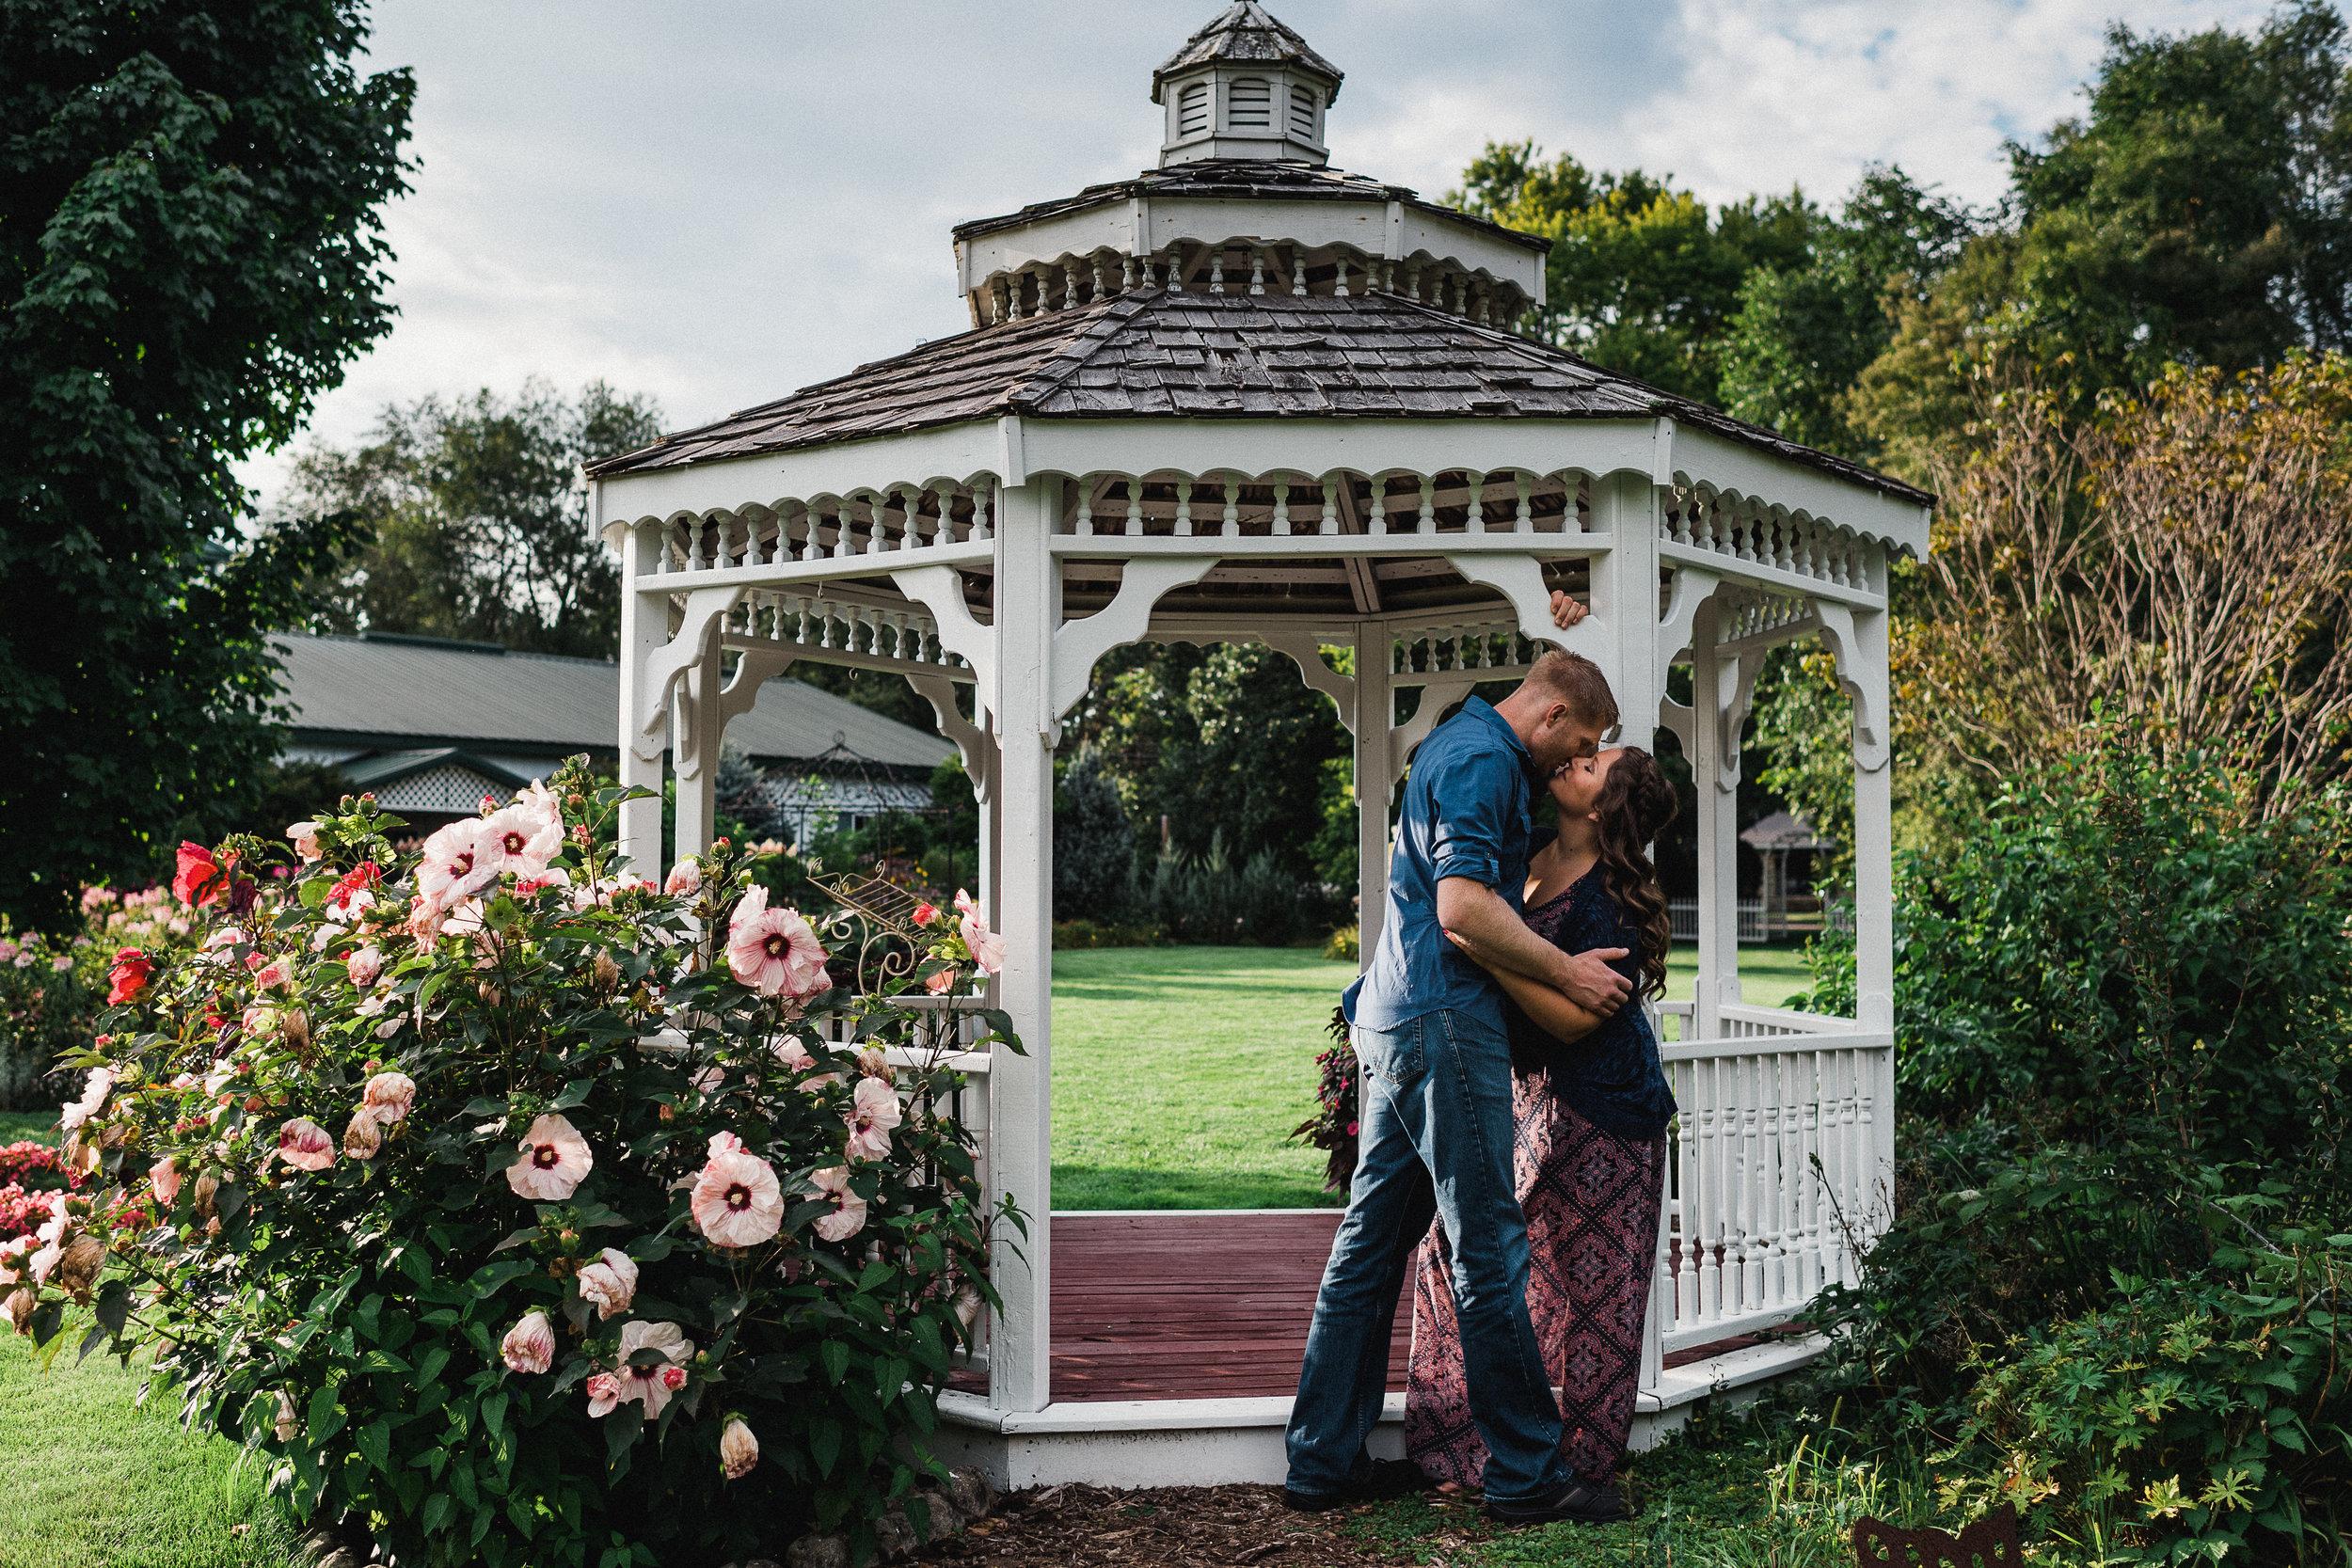 Man leans against a garden gazebo as he kisses his fiance.